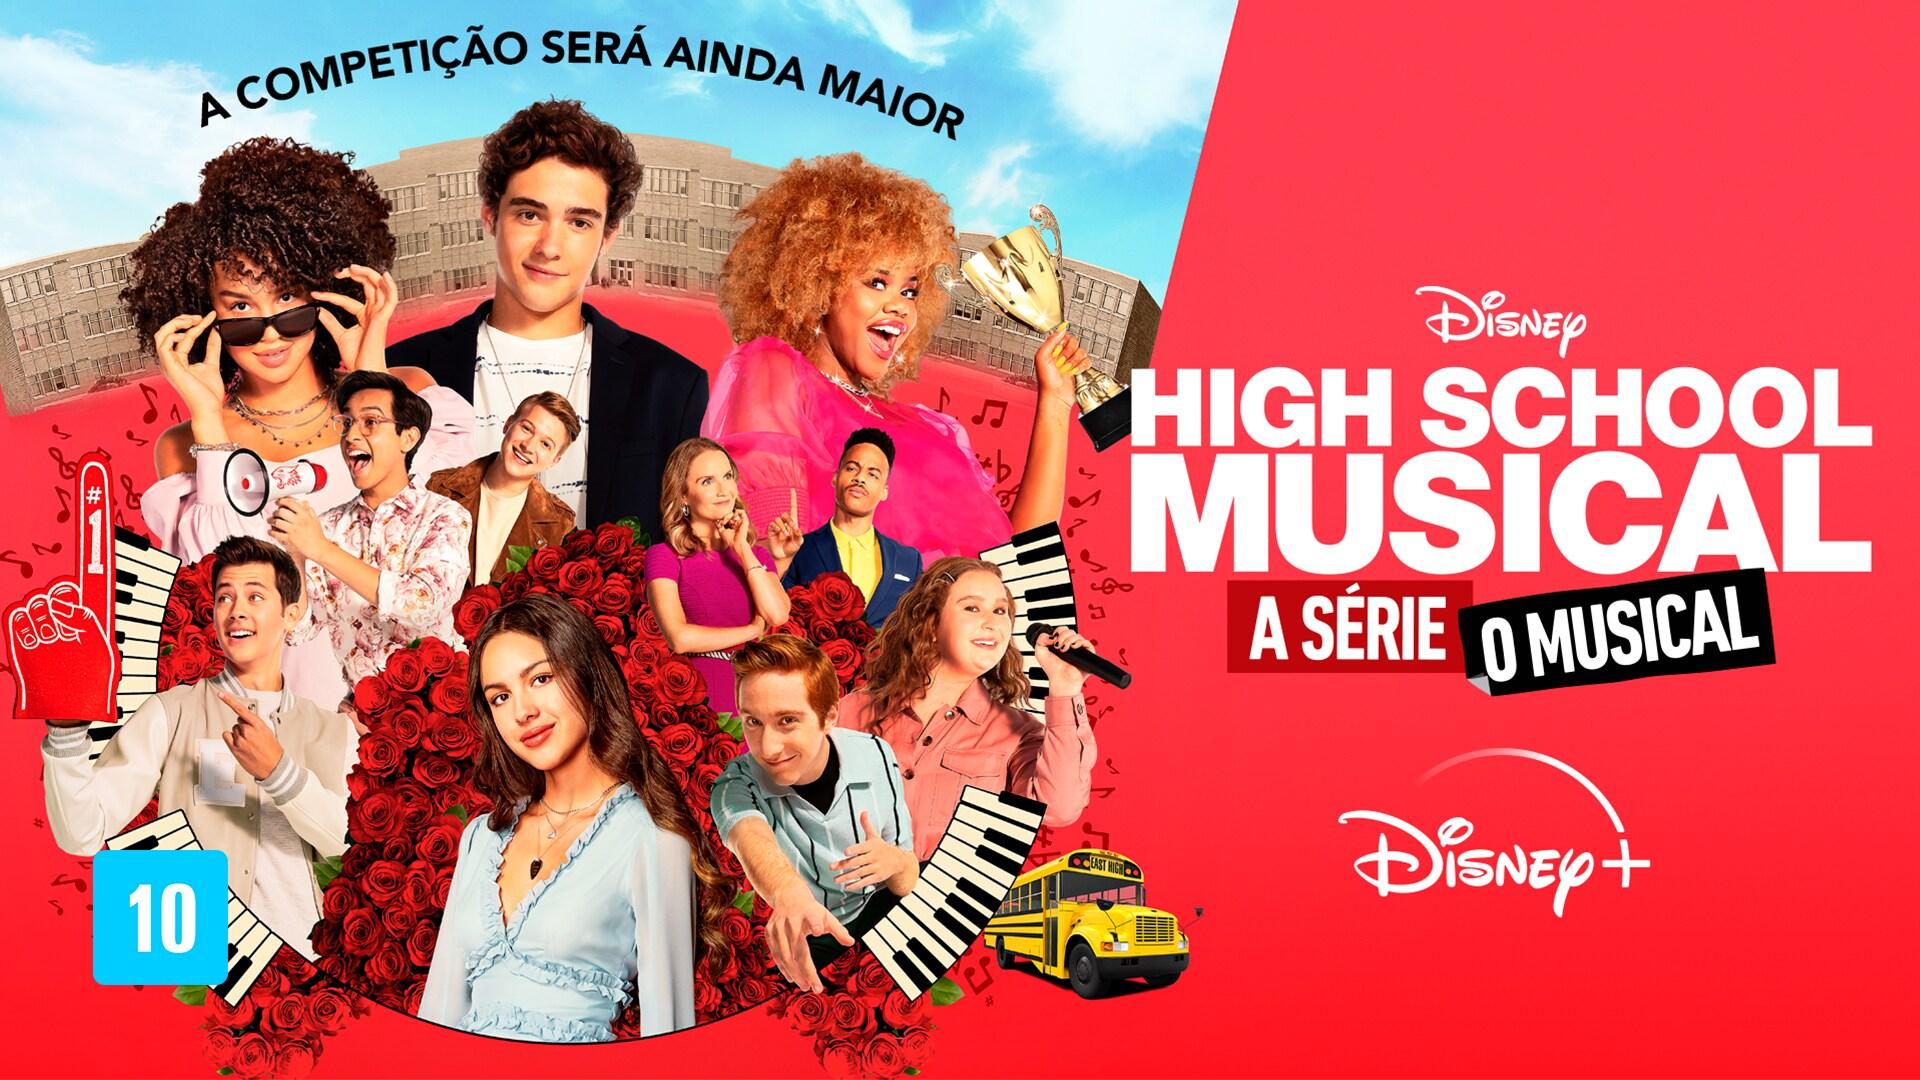 High School Musical: A Série: O Musical | Disponível no Disney+ a partir de 17 de novembro